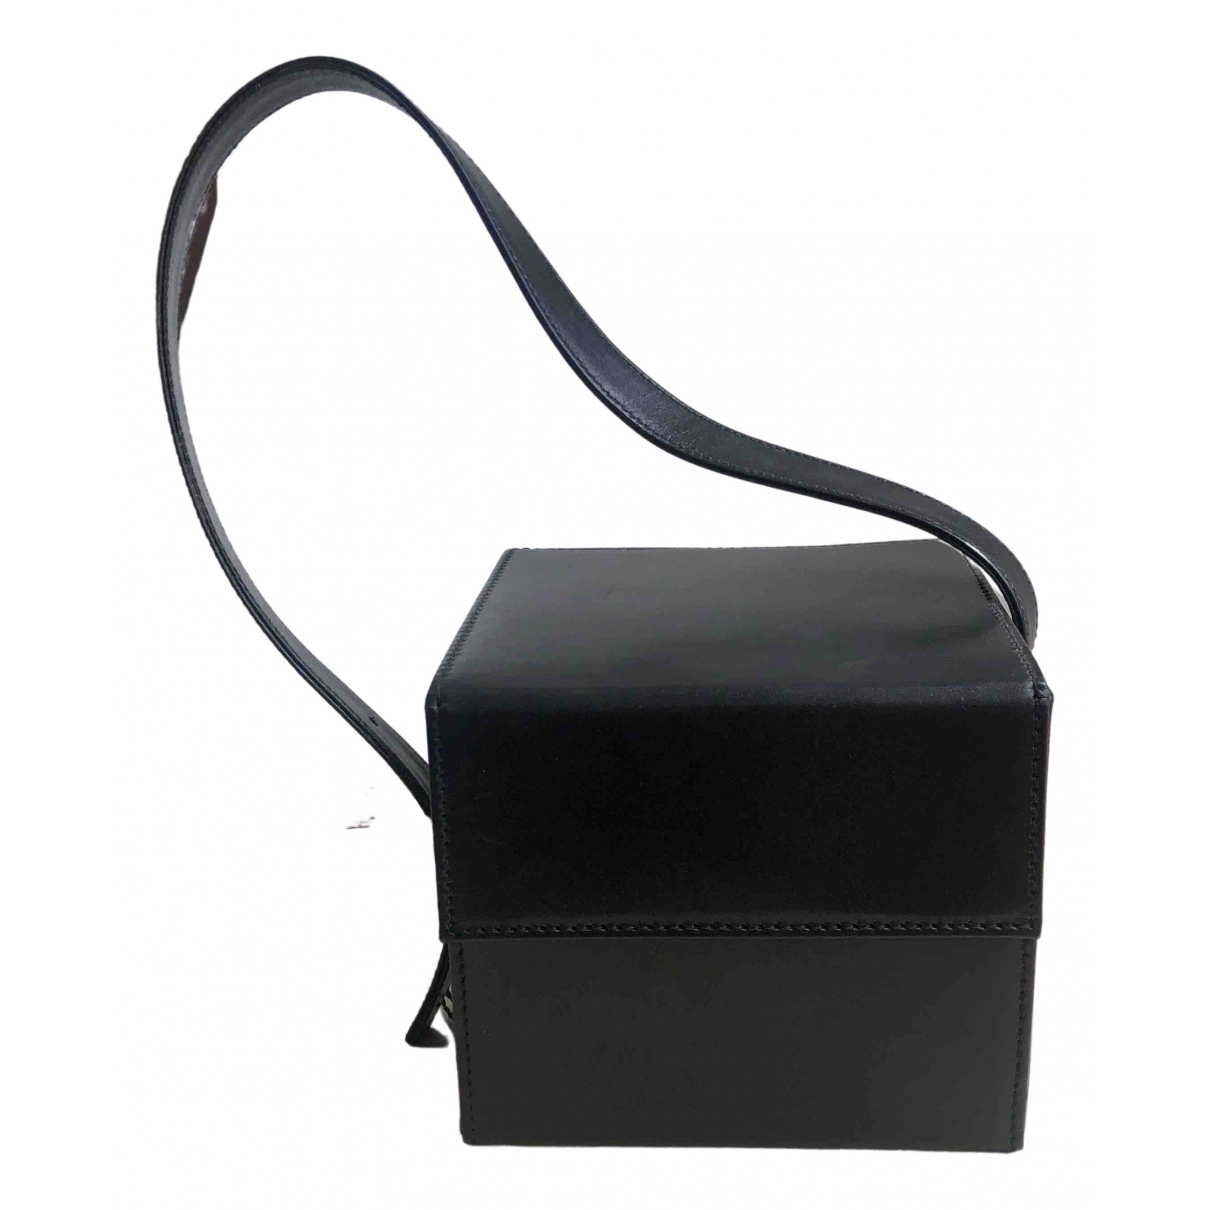 Gianfranco Ferre \N Handtasche in  Schwarz Leder